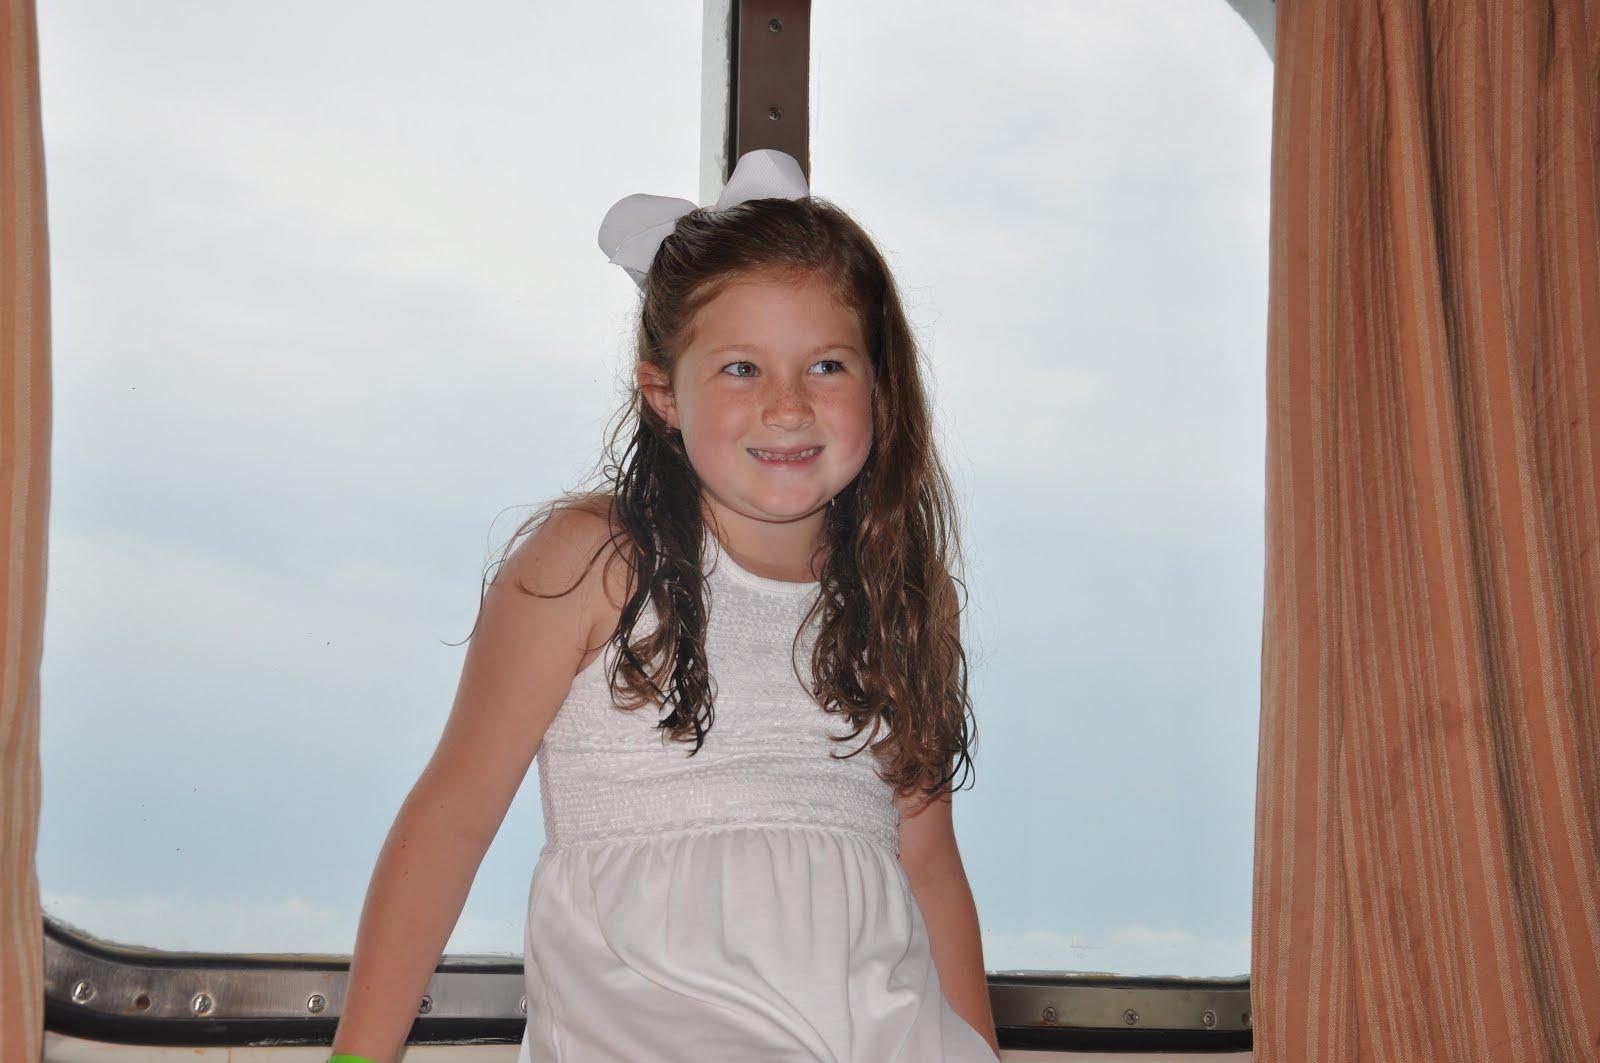 Hope, age 7